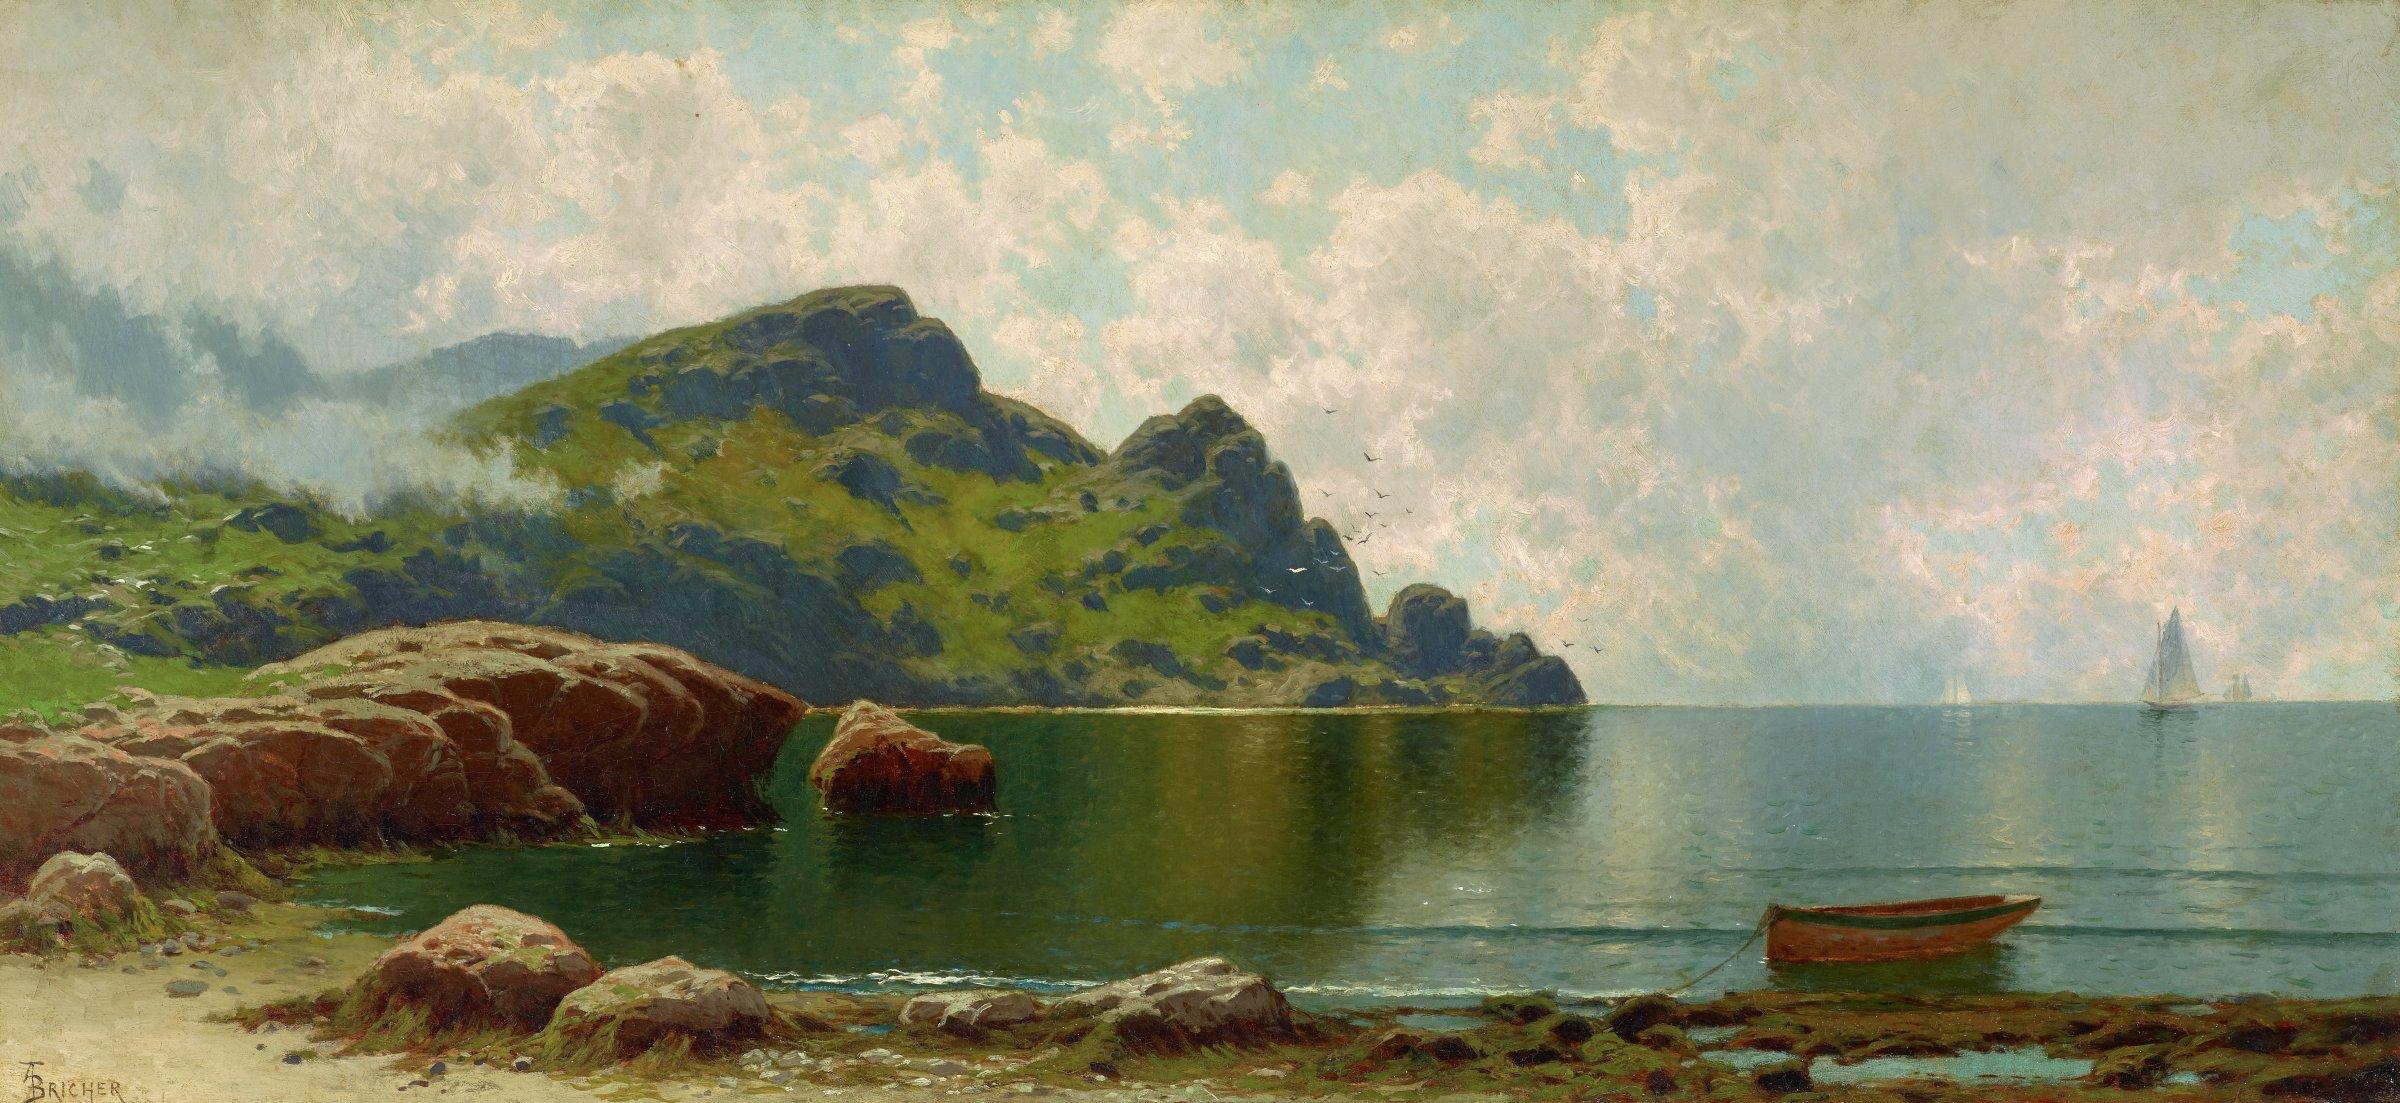 Grand Manan, Alfred Thompson Bricher, oil on canvas